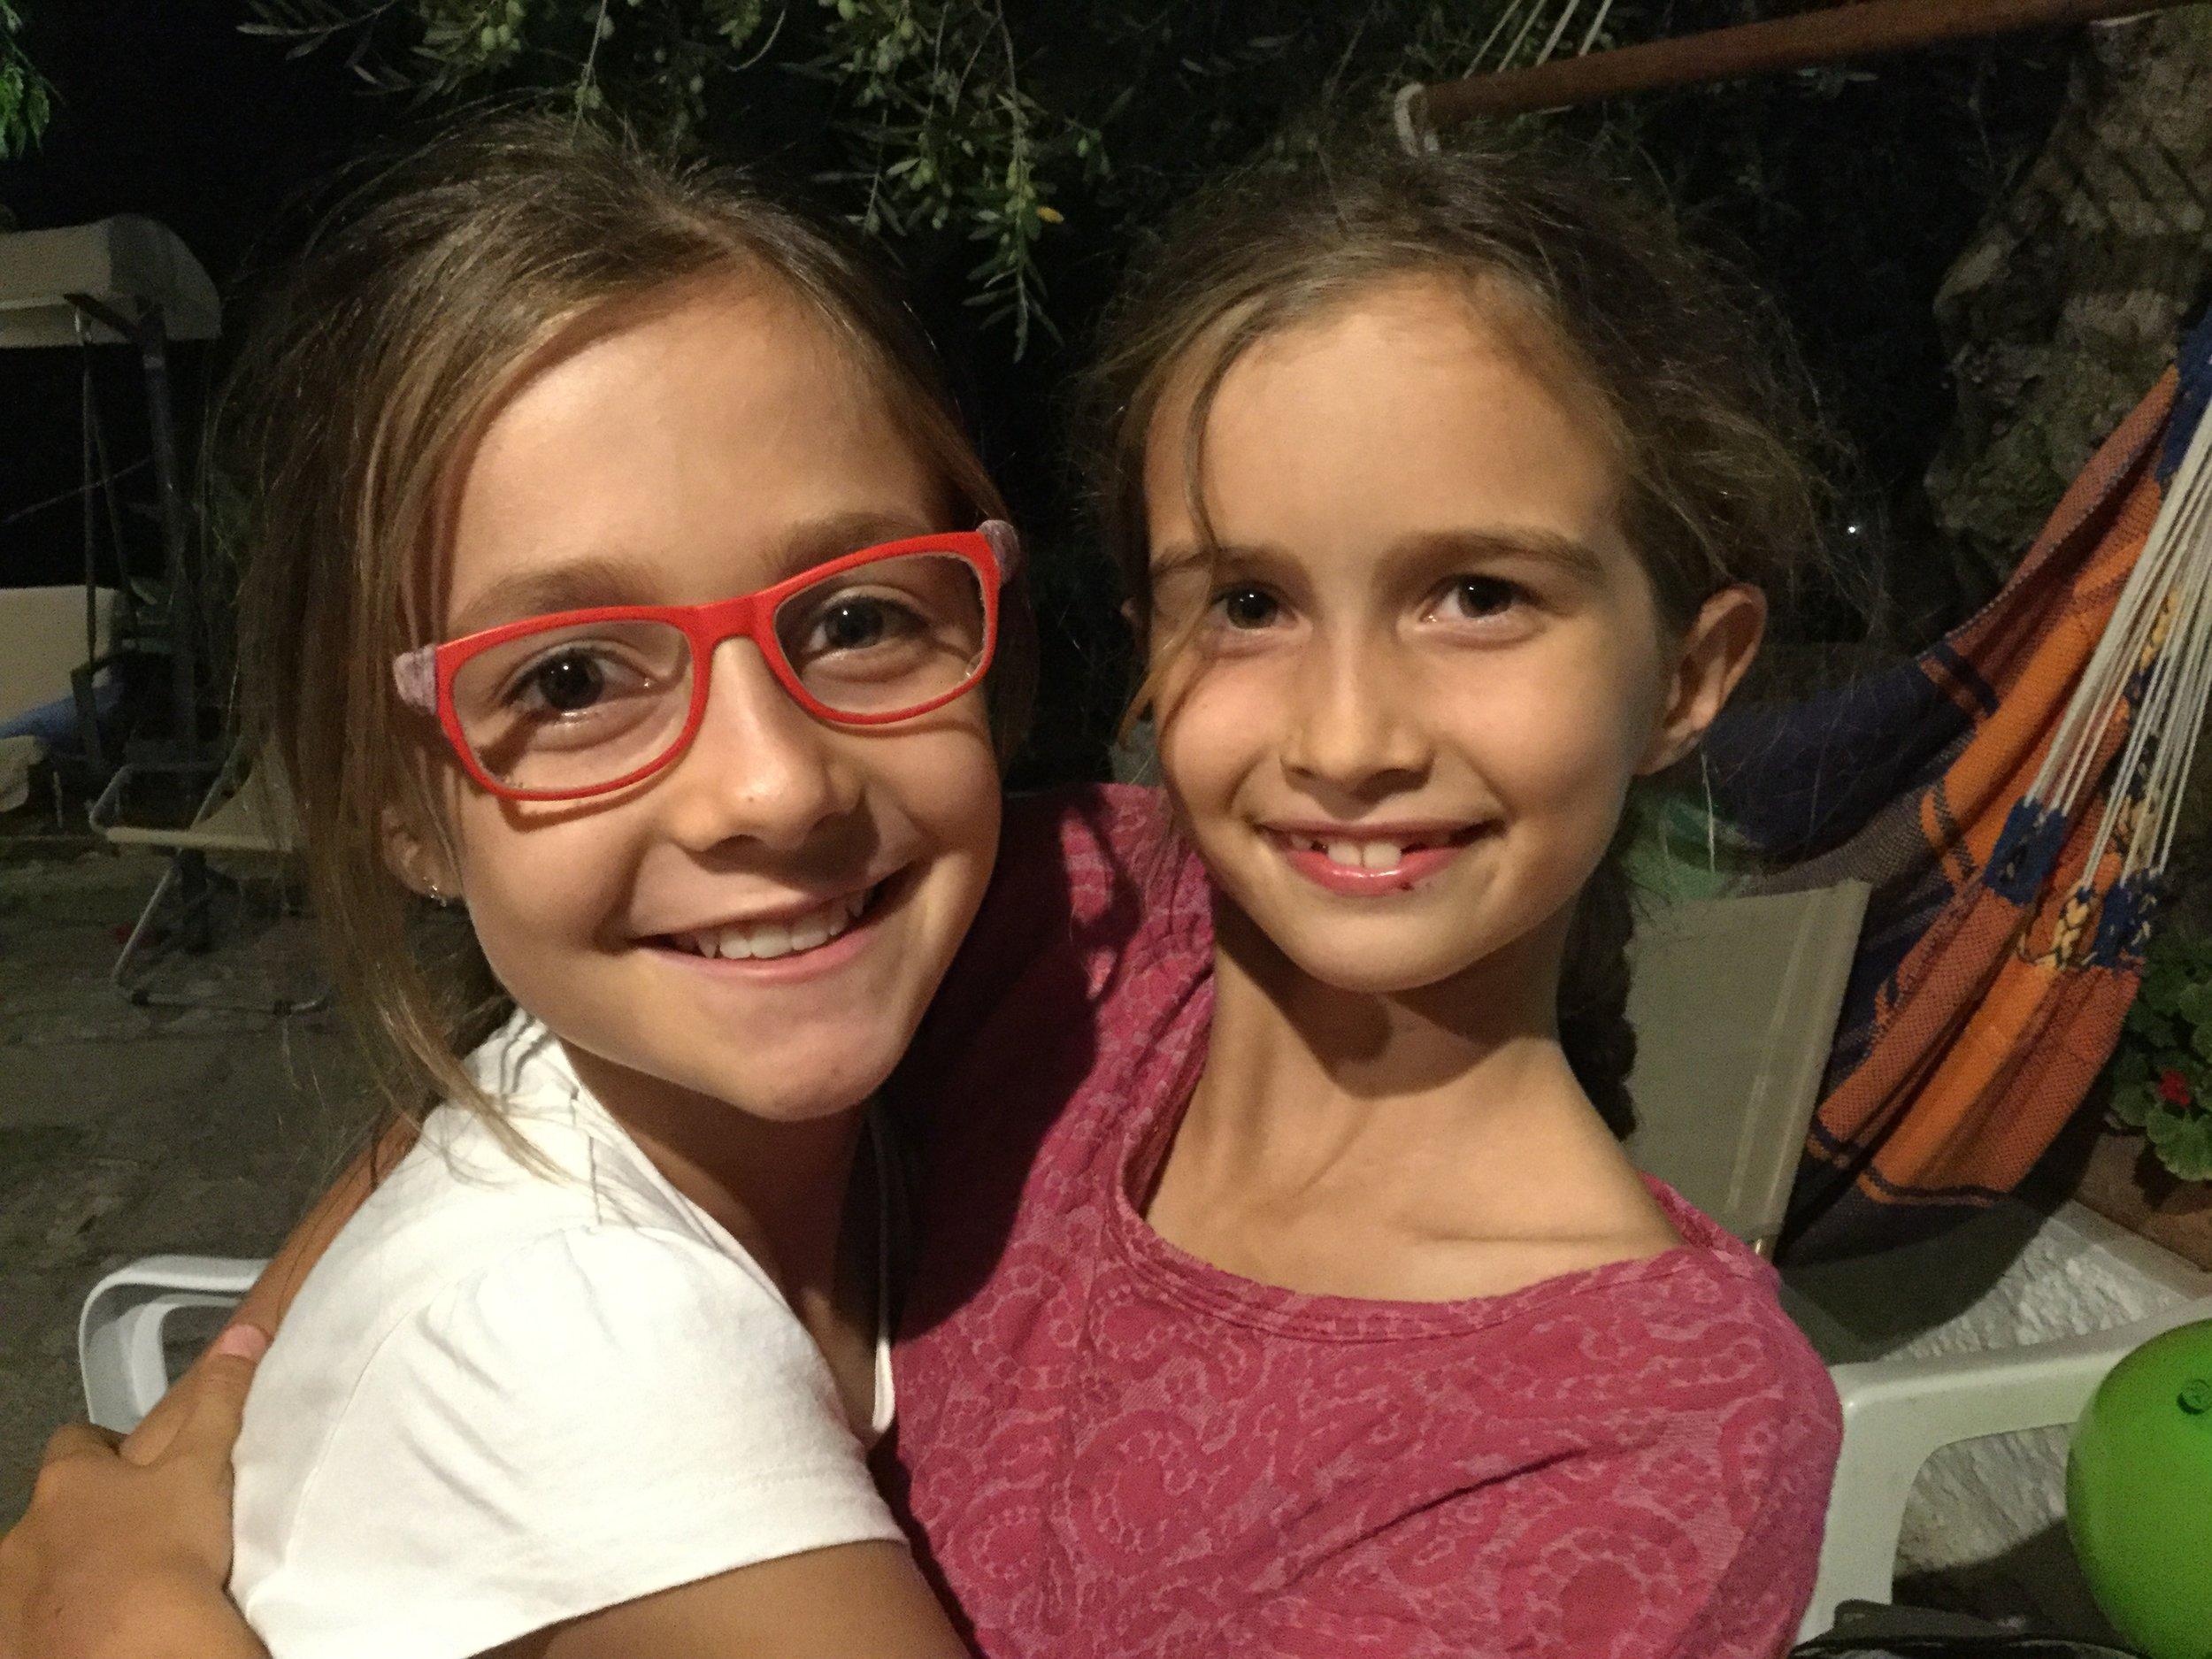 Lili also made a friend in Anila, a neighbor.